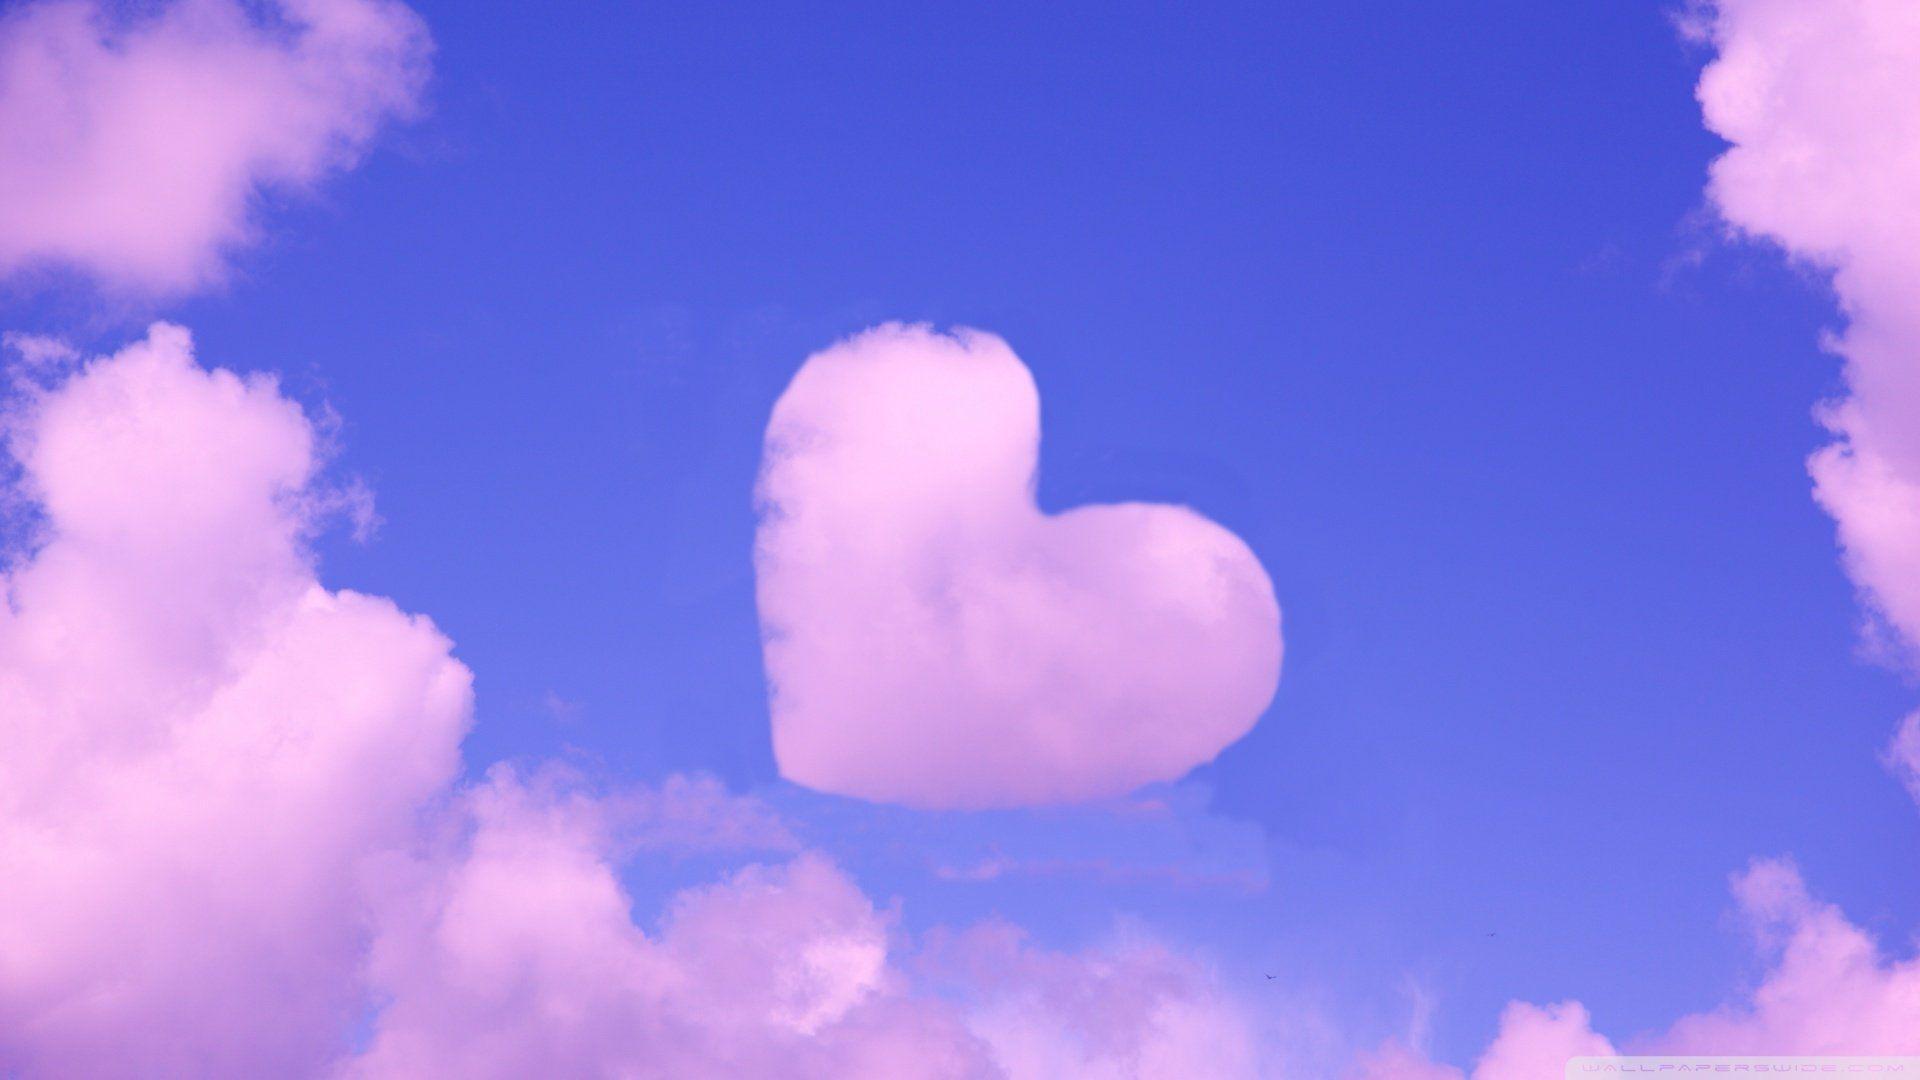 pretty dark tumblr backgrounds dont point of view wallpaper flix a· pink cloudsphoto editingdesktop